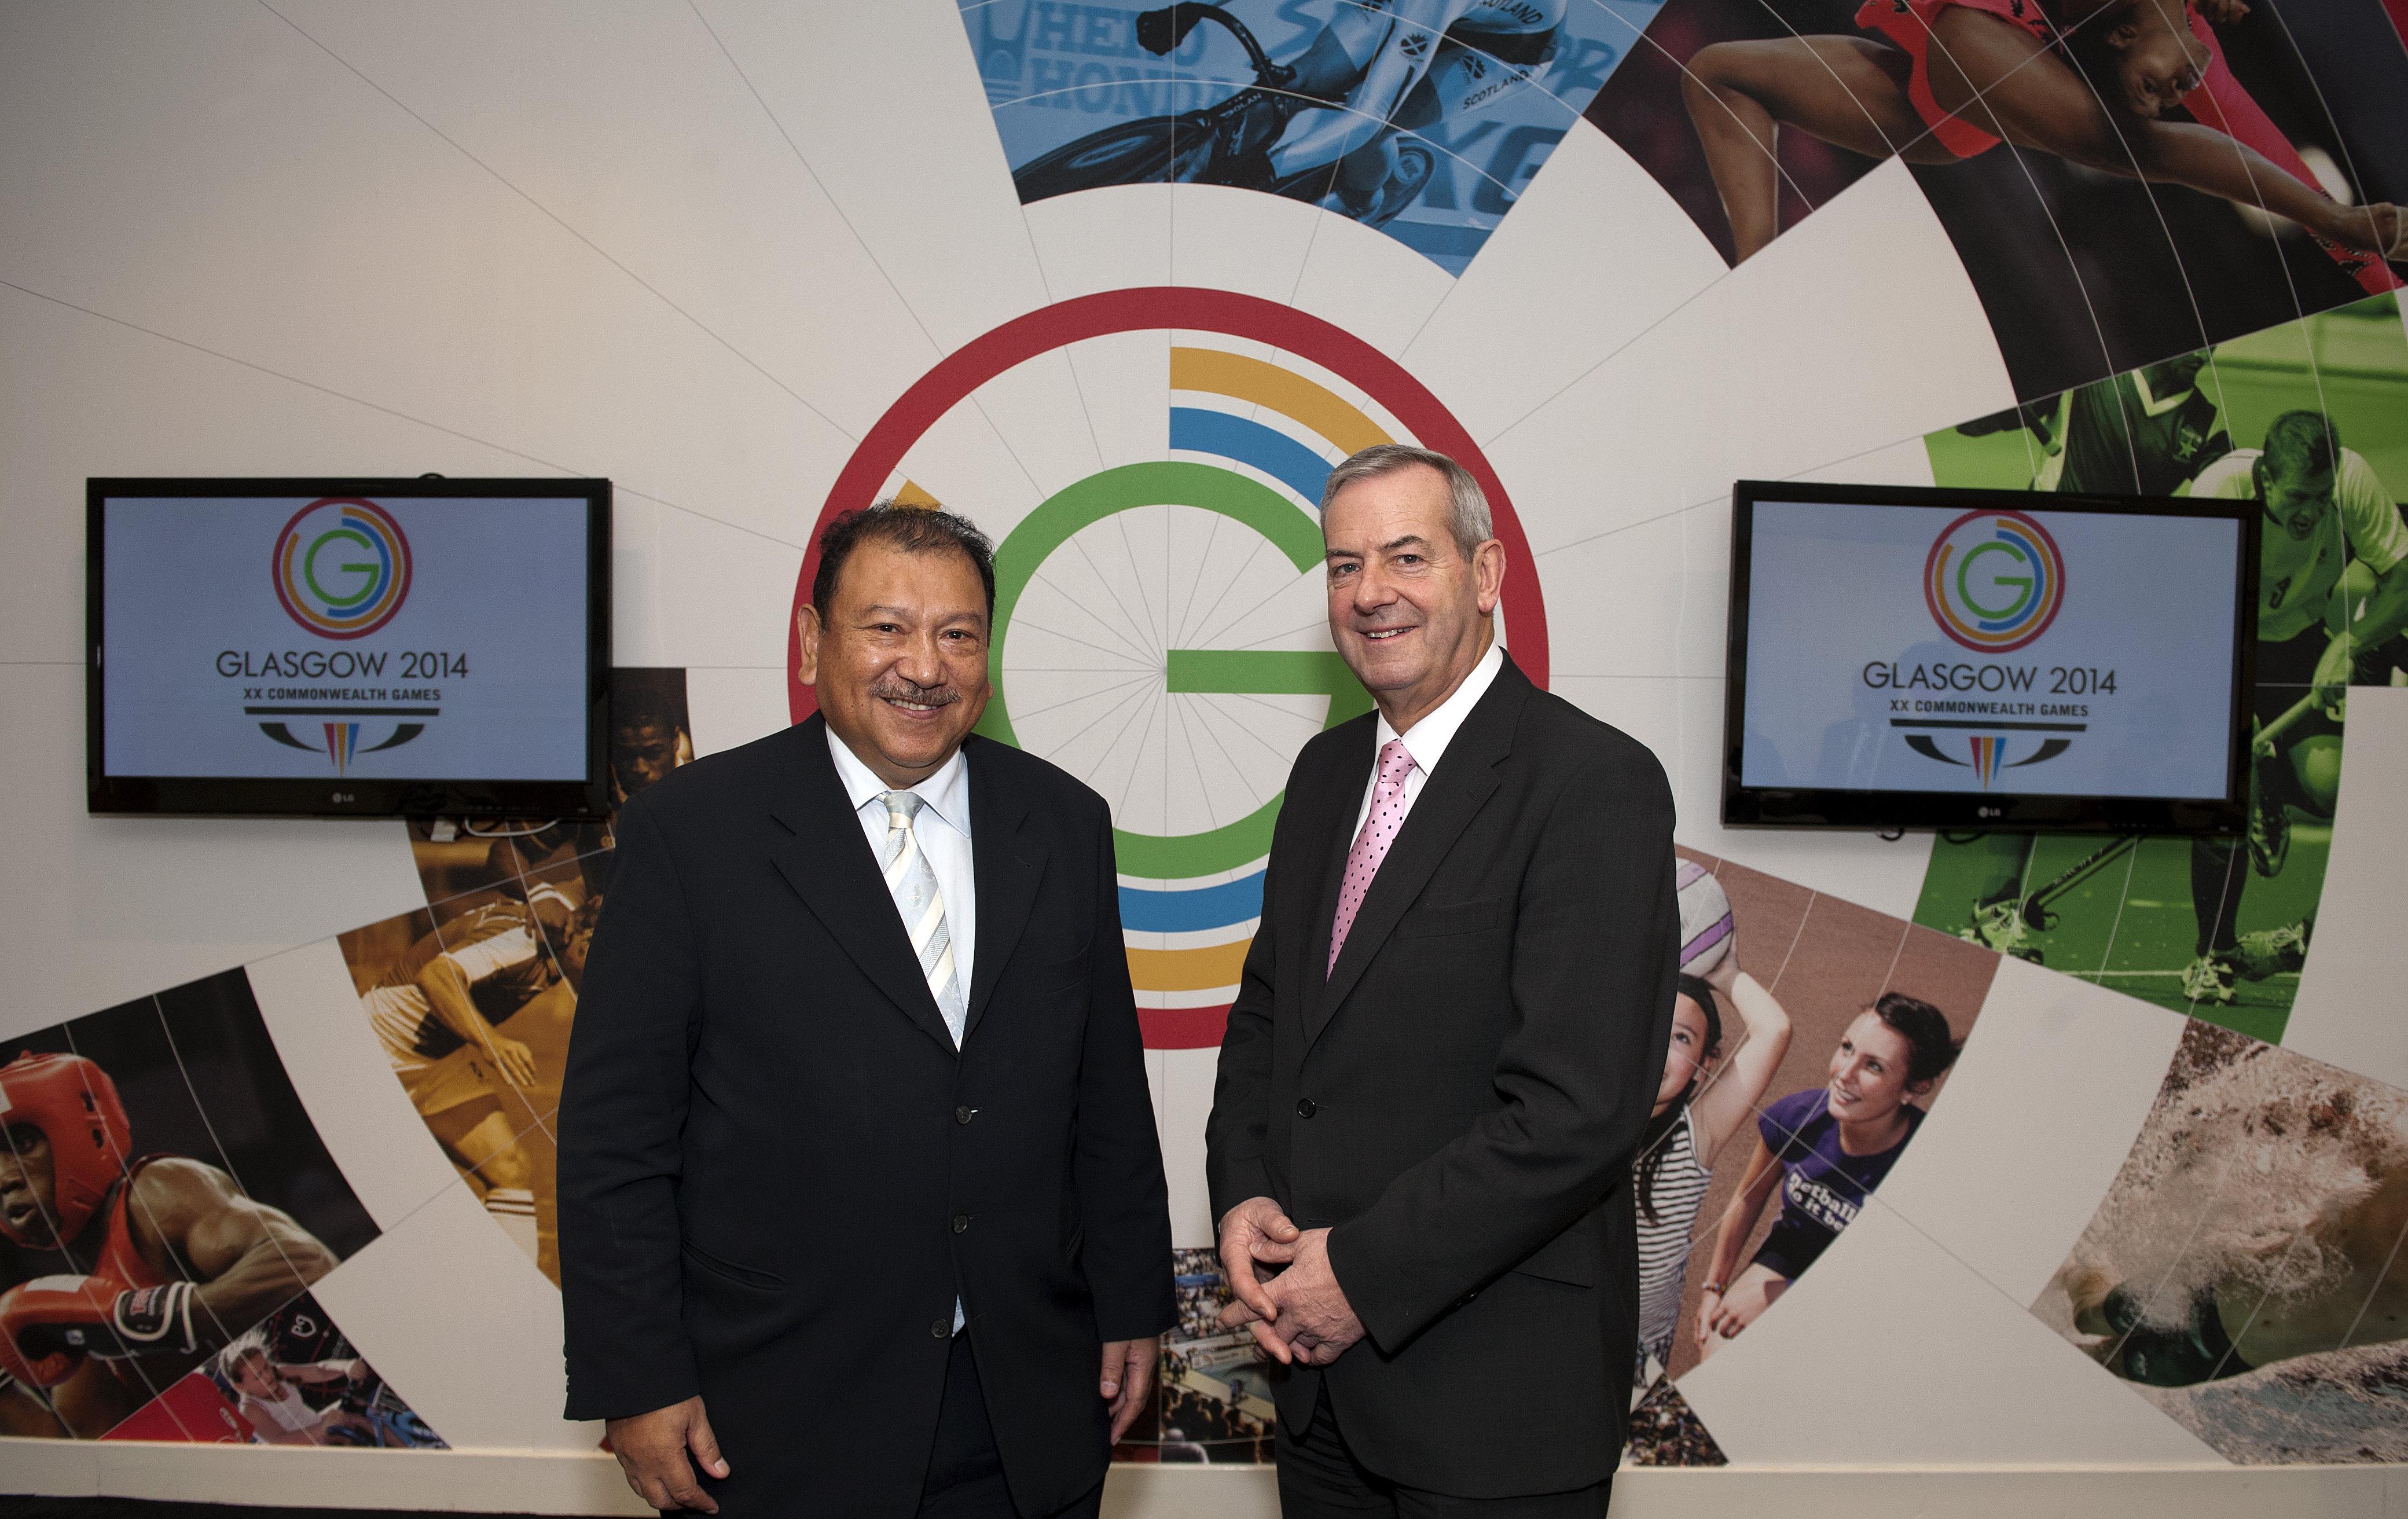 Lord Smith_with_Prince_Tunku_Imran_Glasgow_January_19_2012